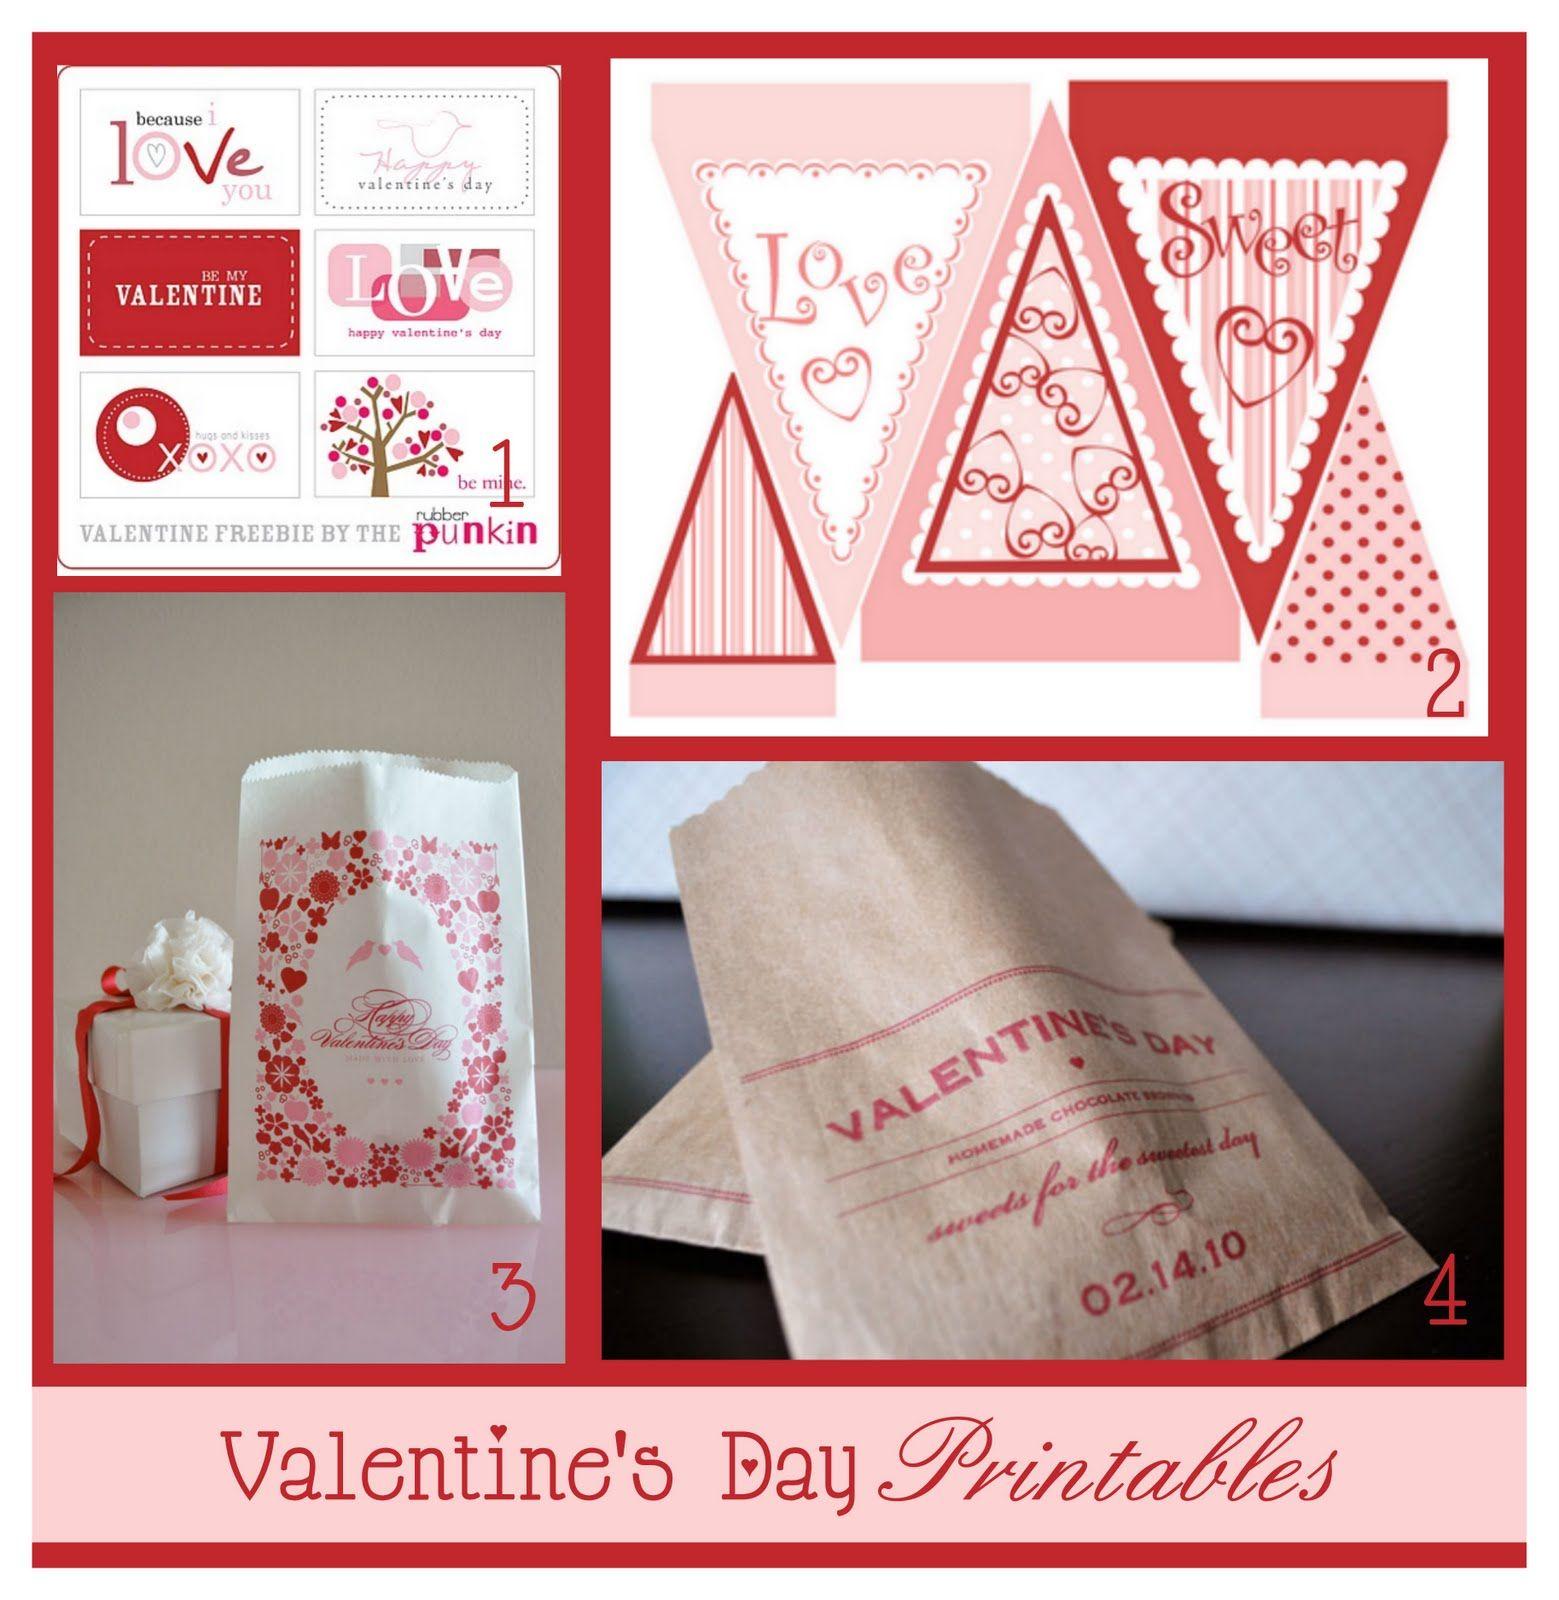 Homemaking Fun: Valentine's Day